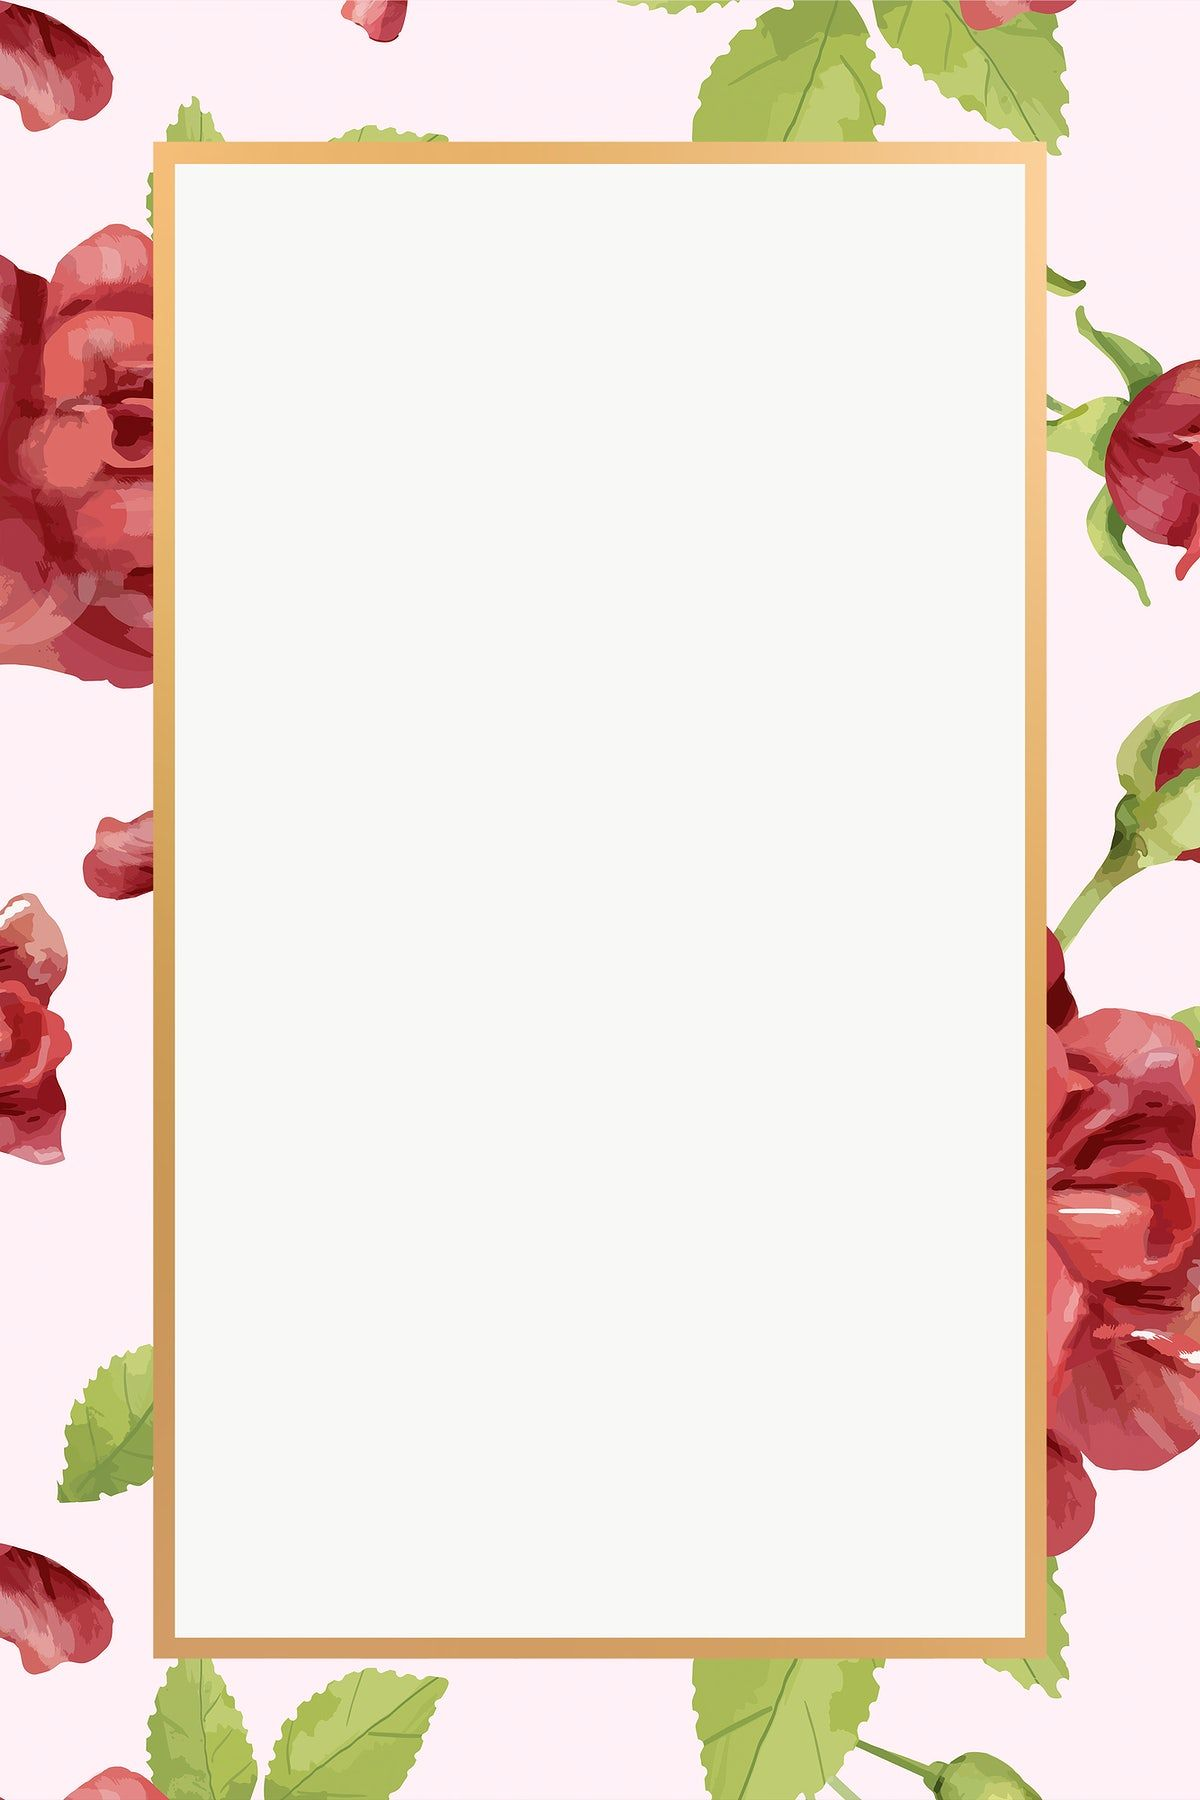 Gold Rectangle Rose Flower Frame Design Element Free Image By Rawpixel Com In 2020 Flower Frame Design Element Frame Design